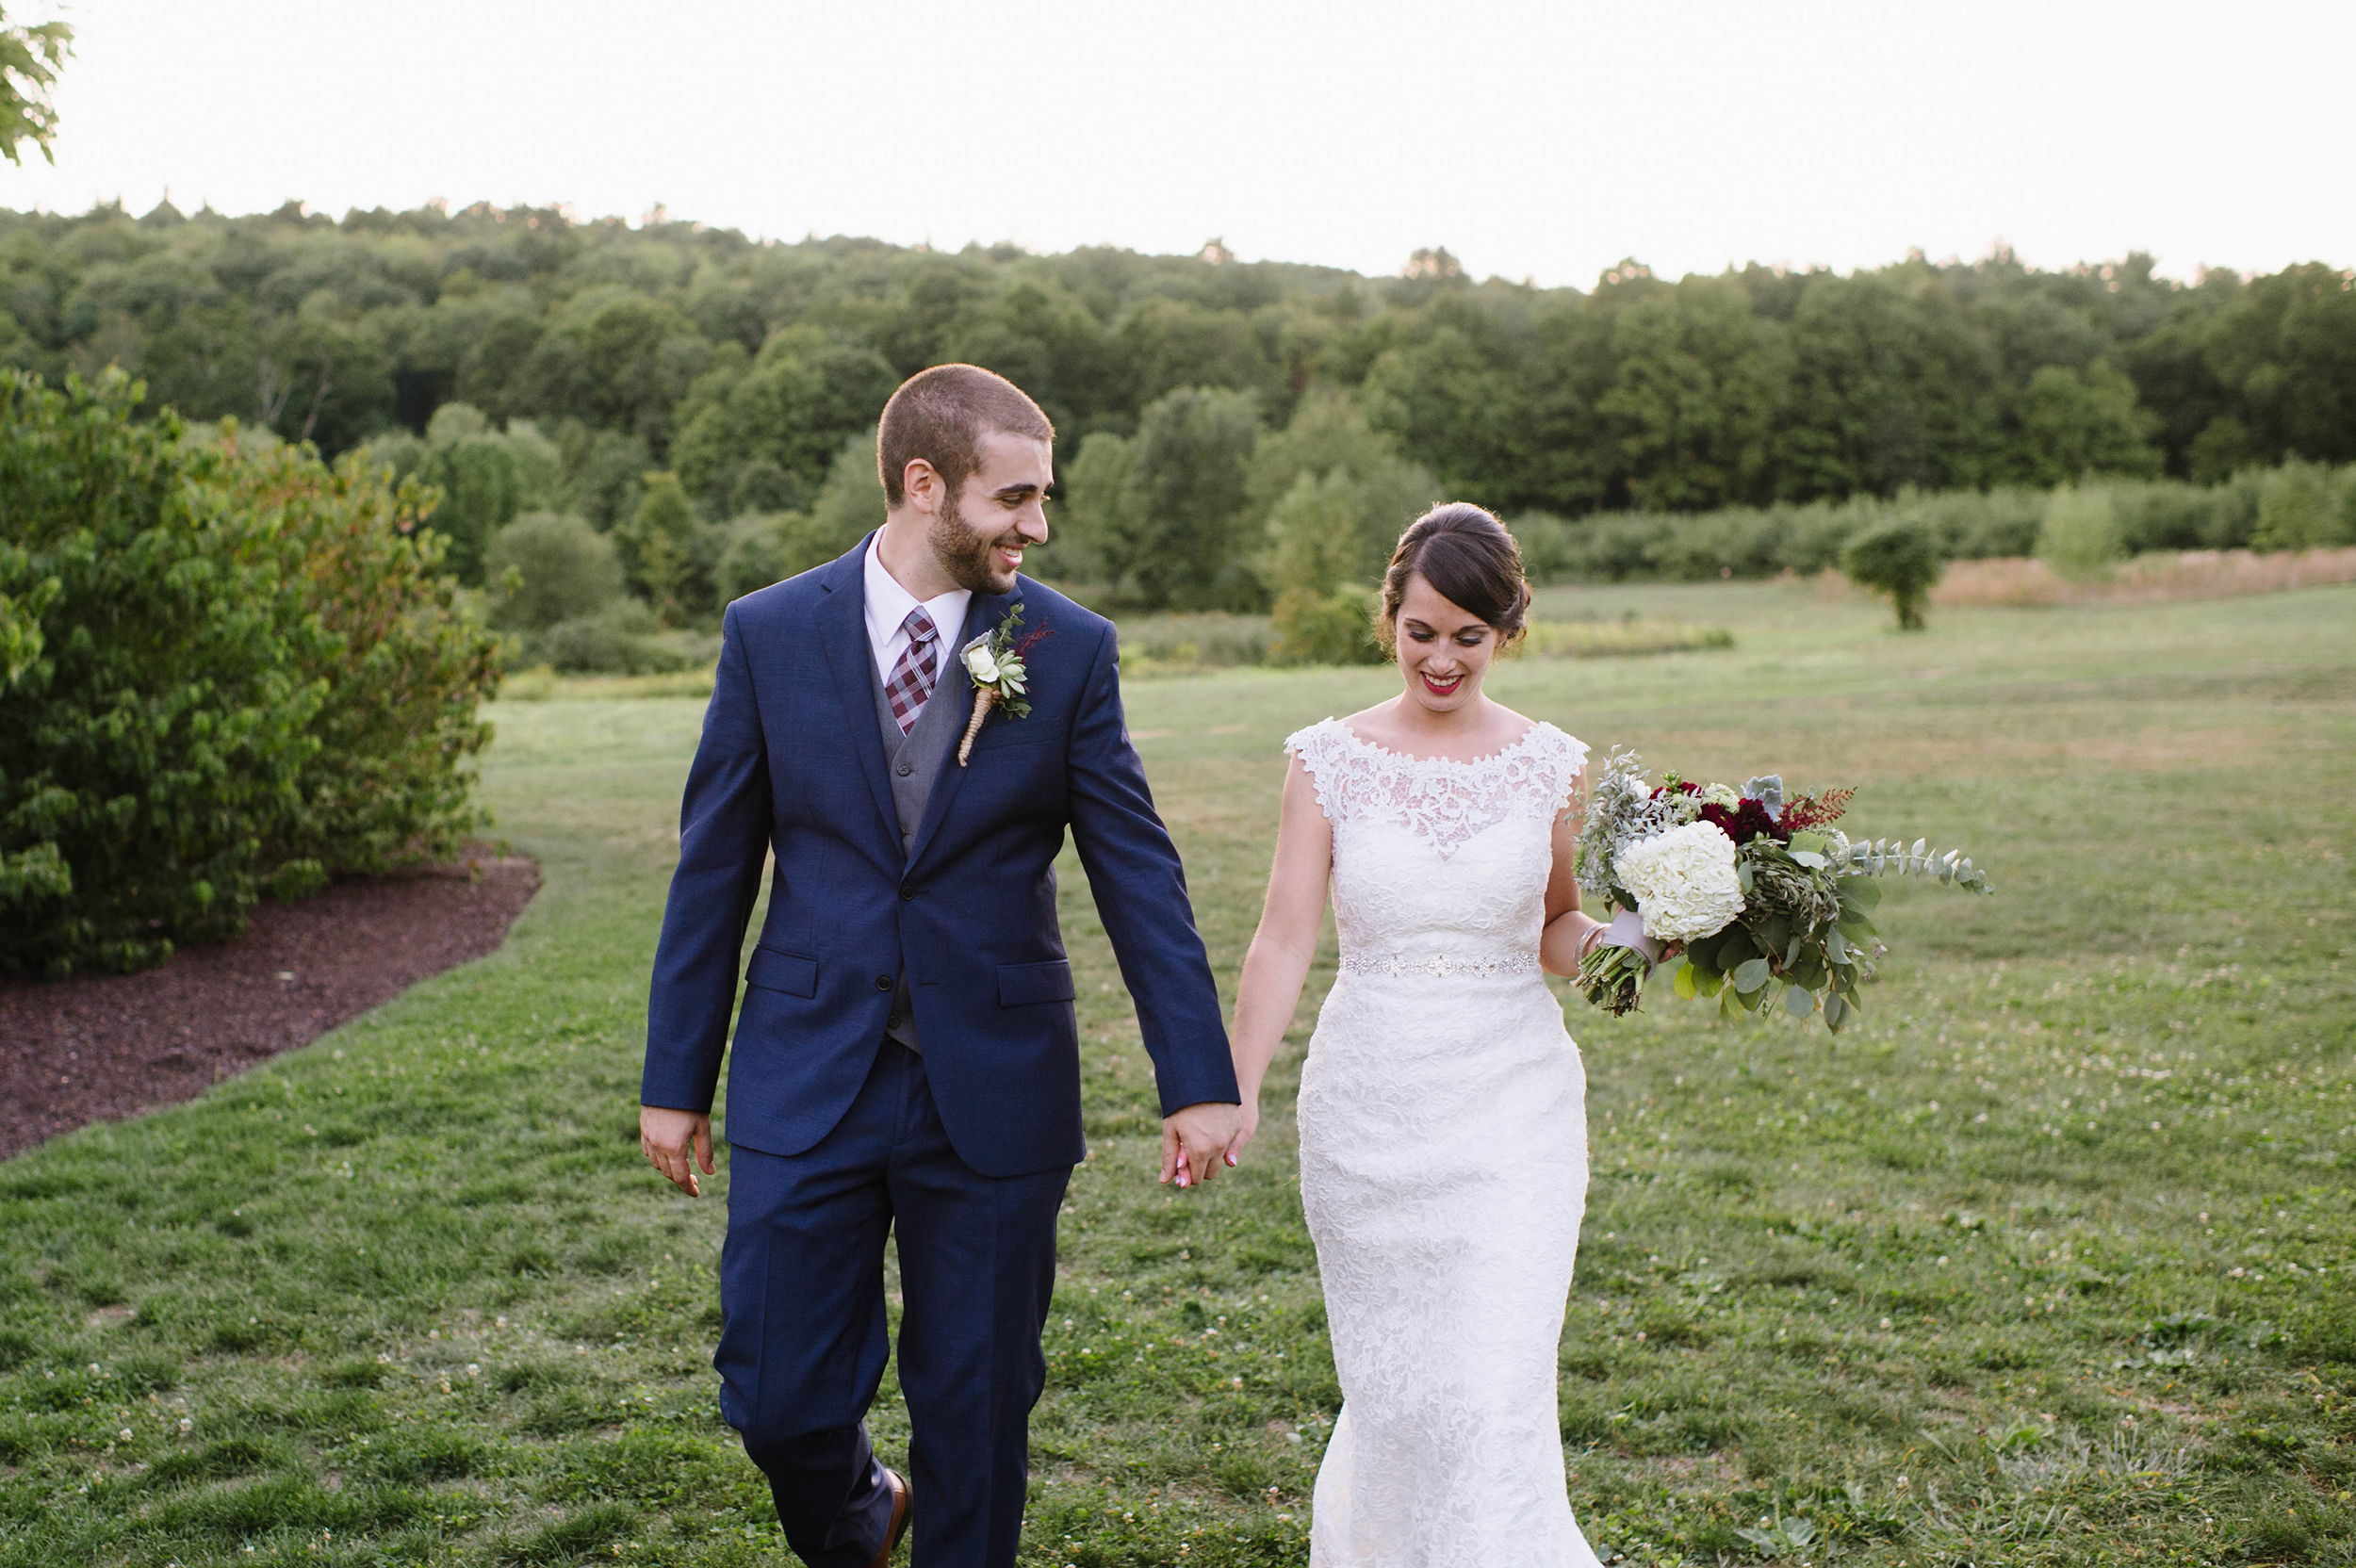 Quonquont-Farm-Wedding045.jpg